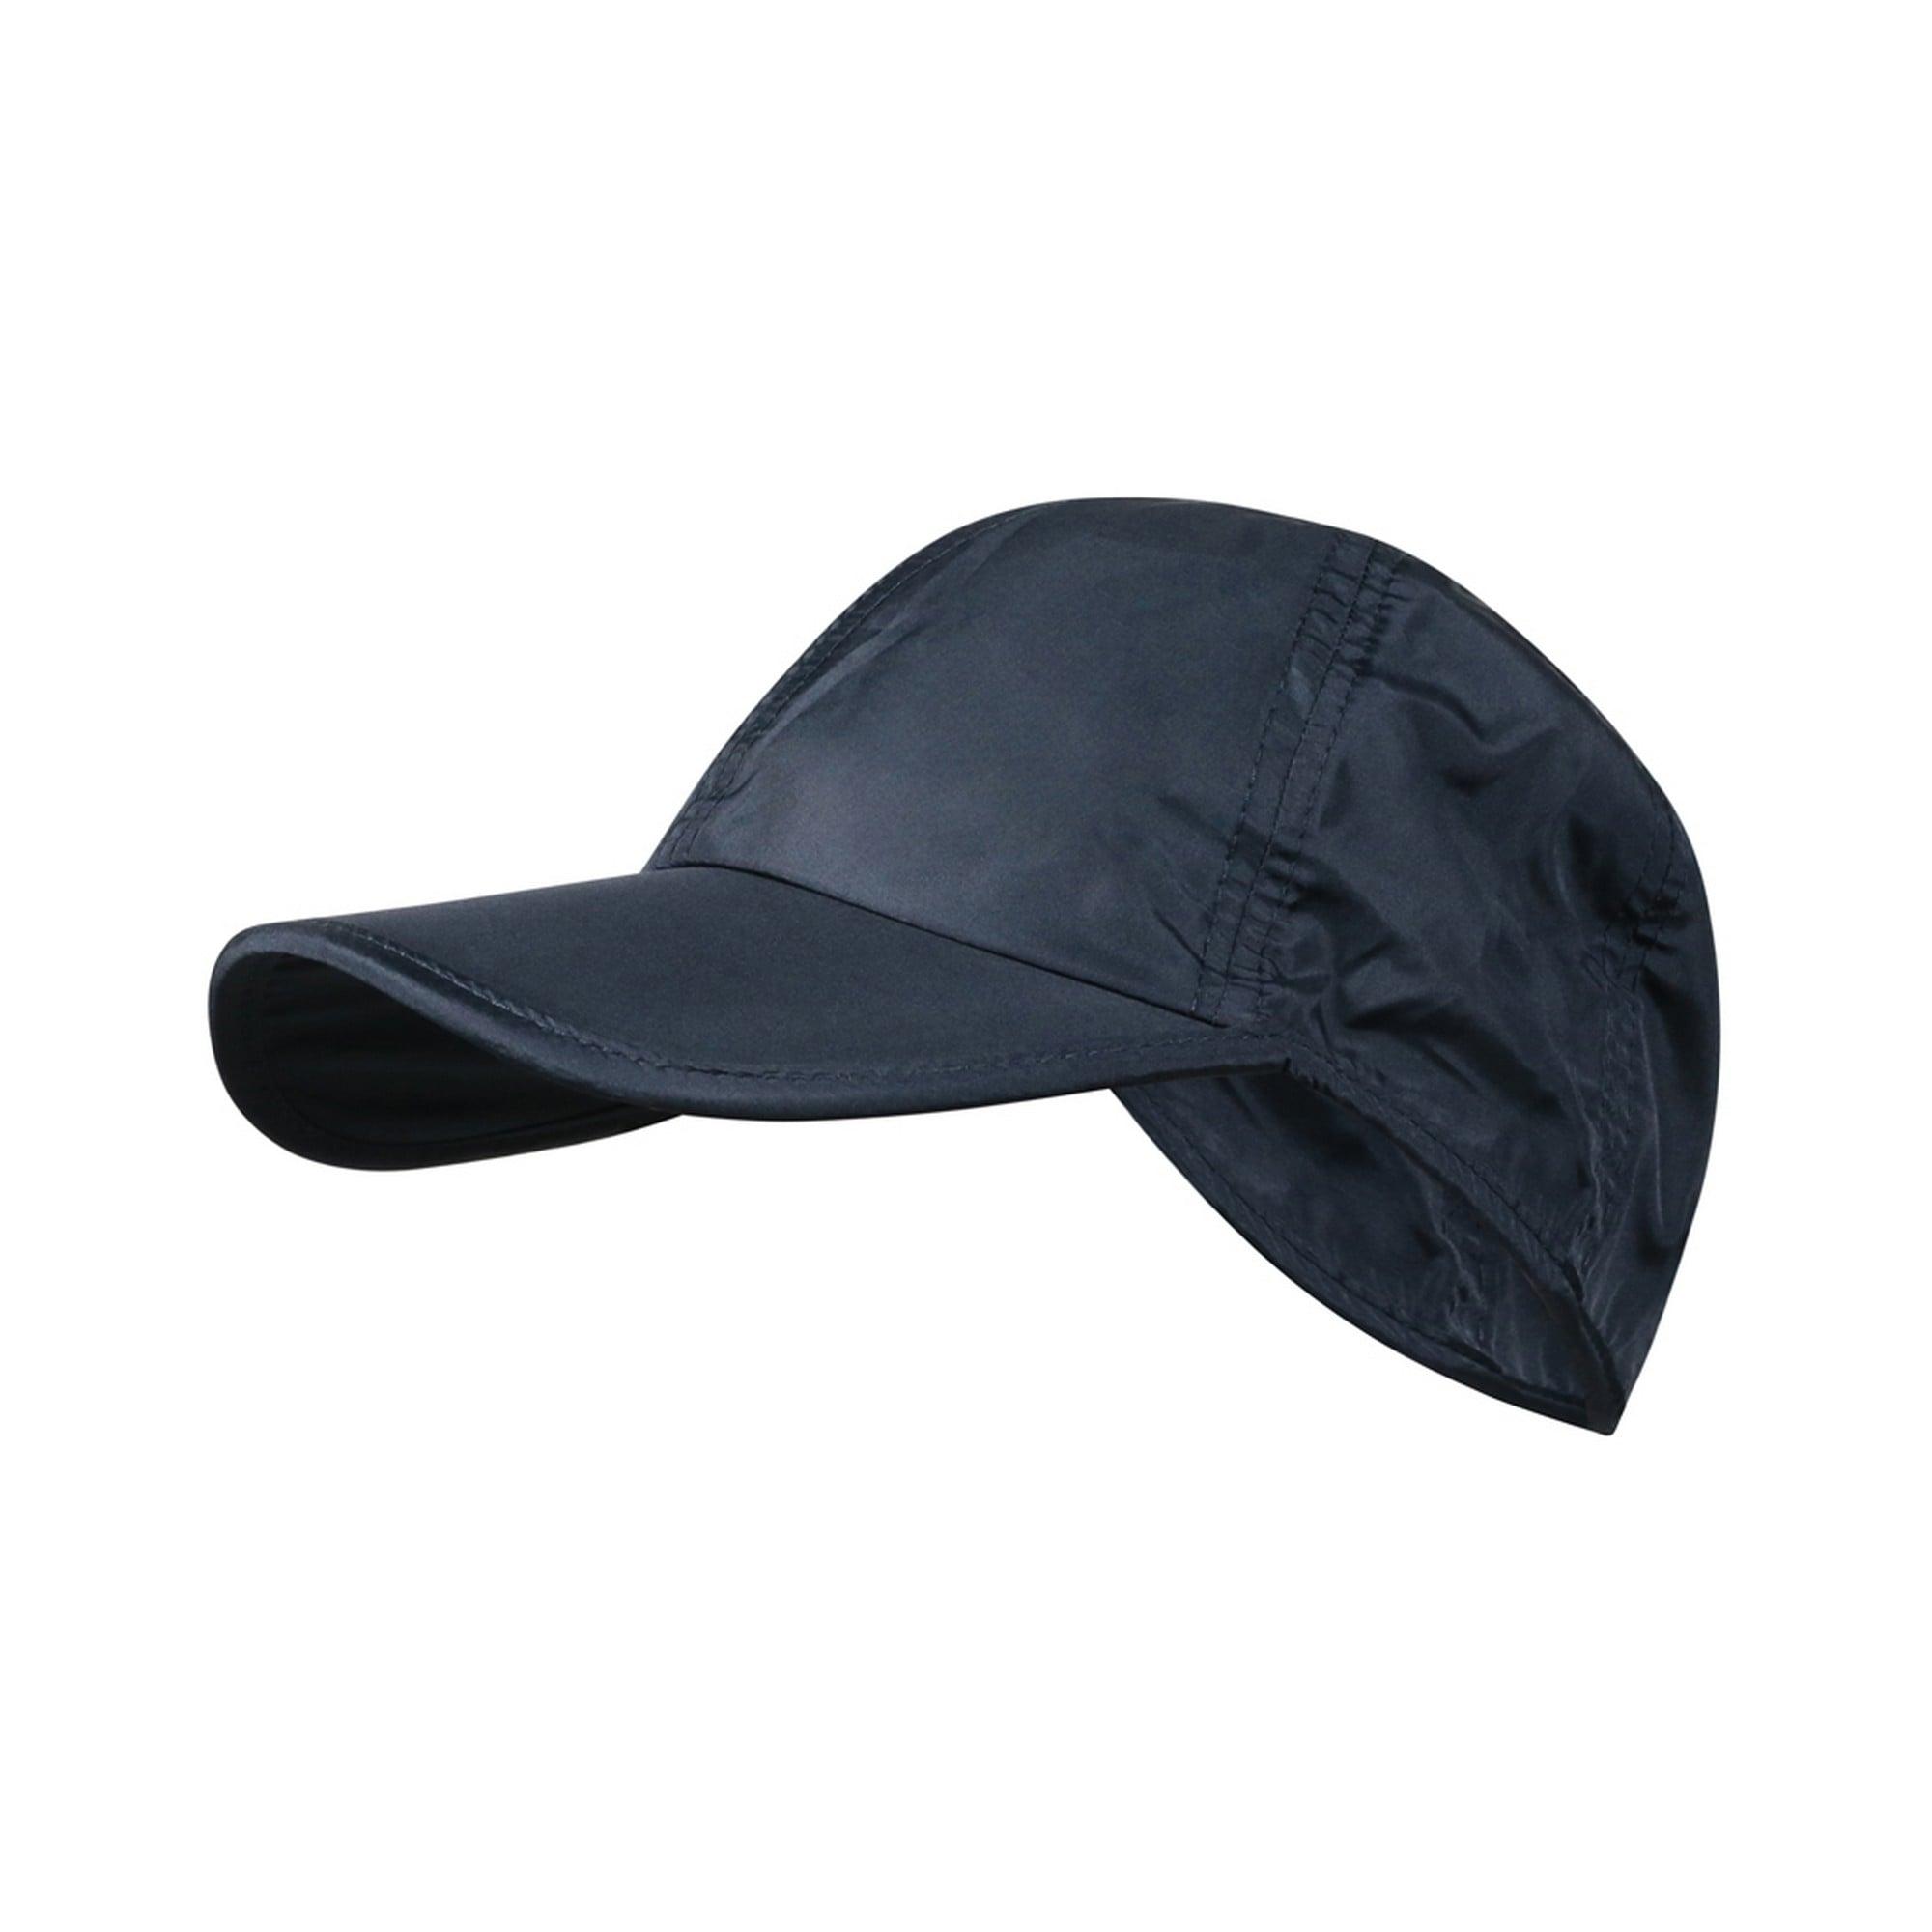 AWDIS Baseball Cap AWDis Unisex Baseballkappe Just Cool, extrem leicht   Accessoires > Caps   Awdis